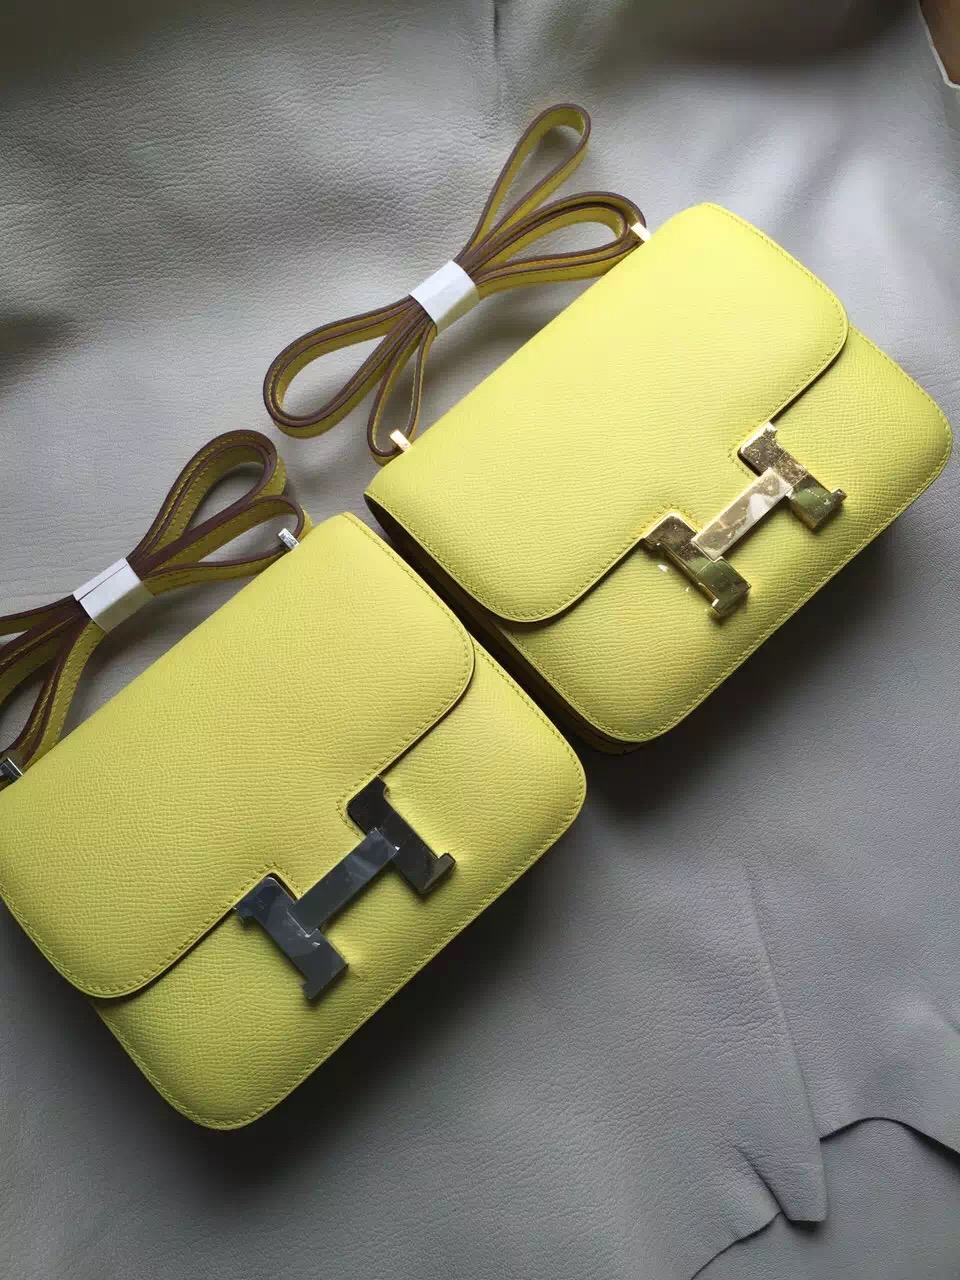 Wholesale Hermes Constance Bag 18cm C9 Yellow Epsom Leather